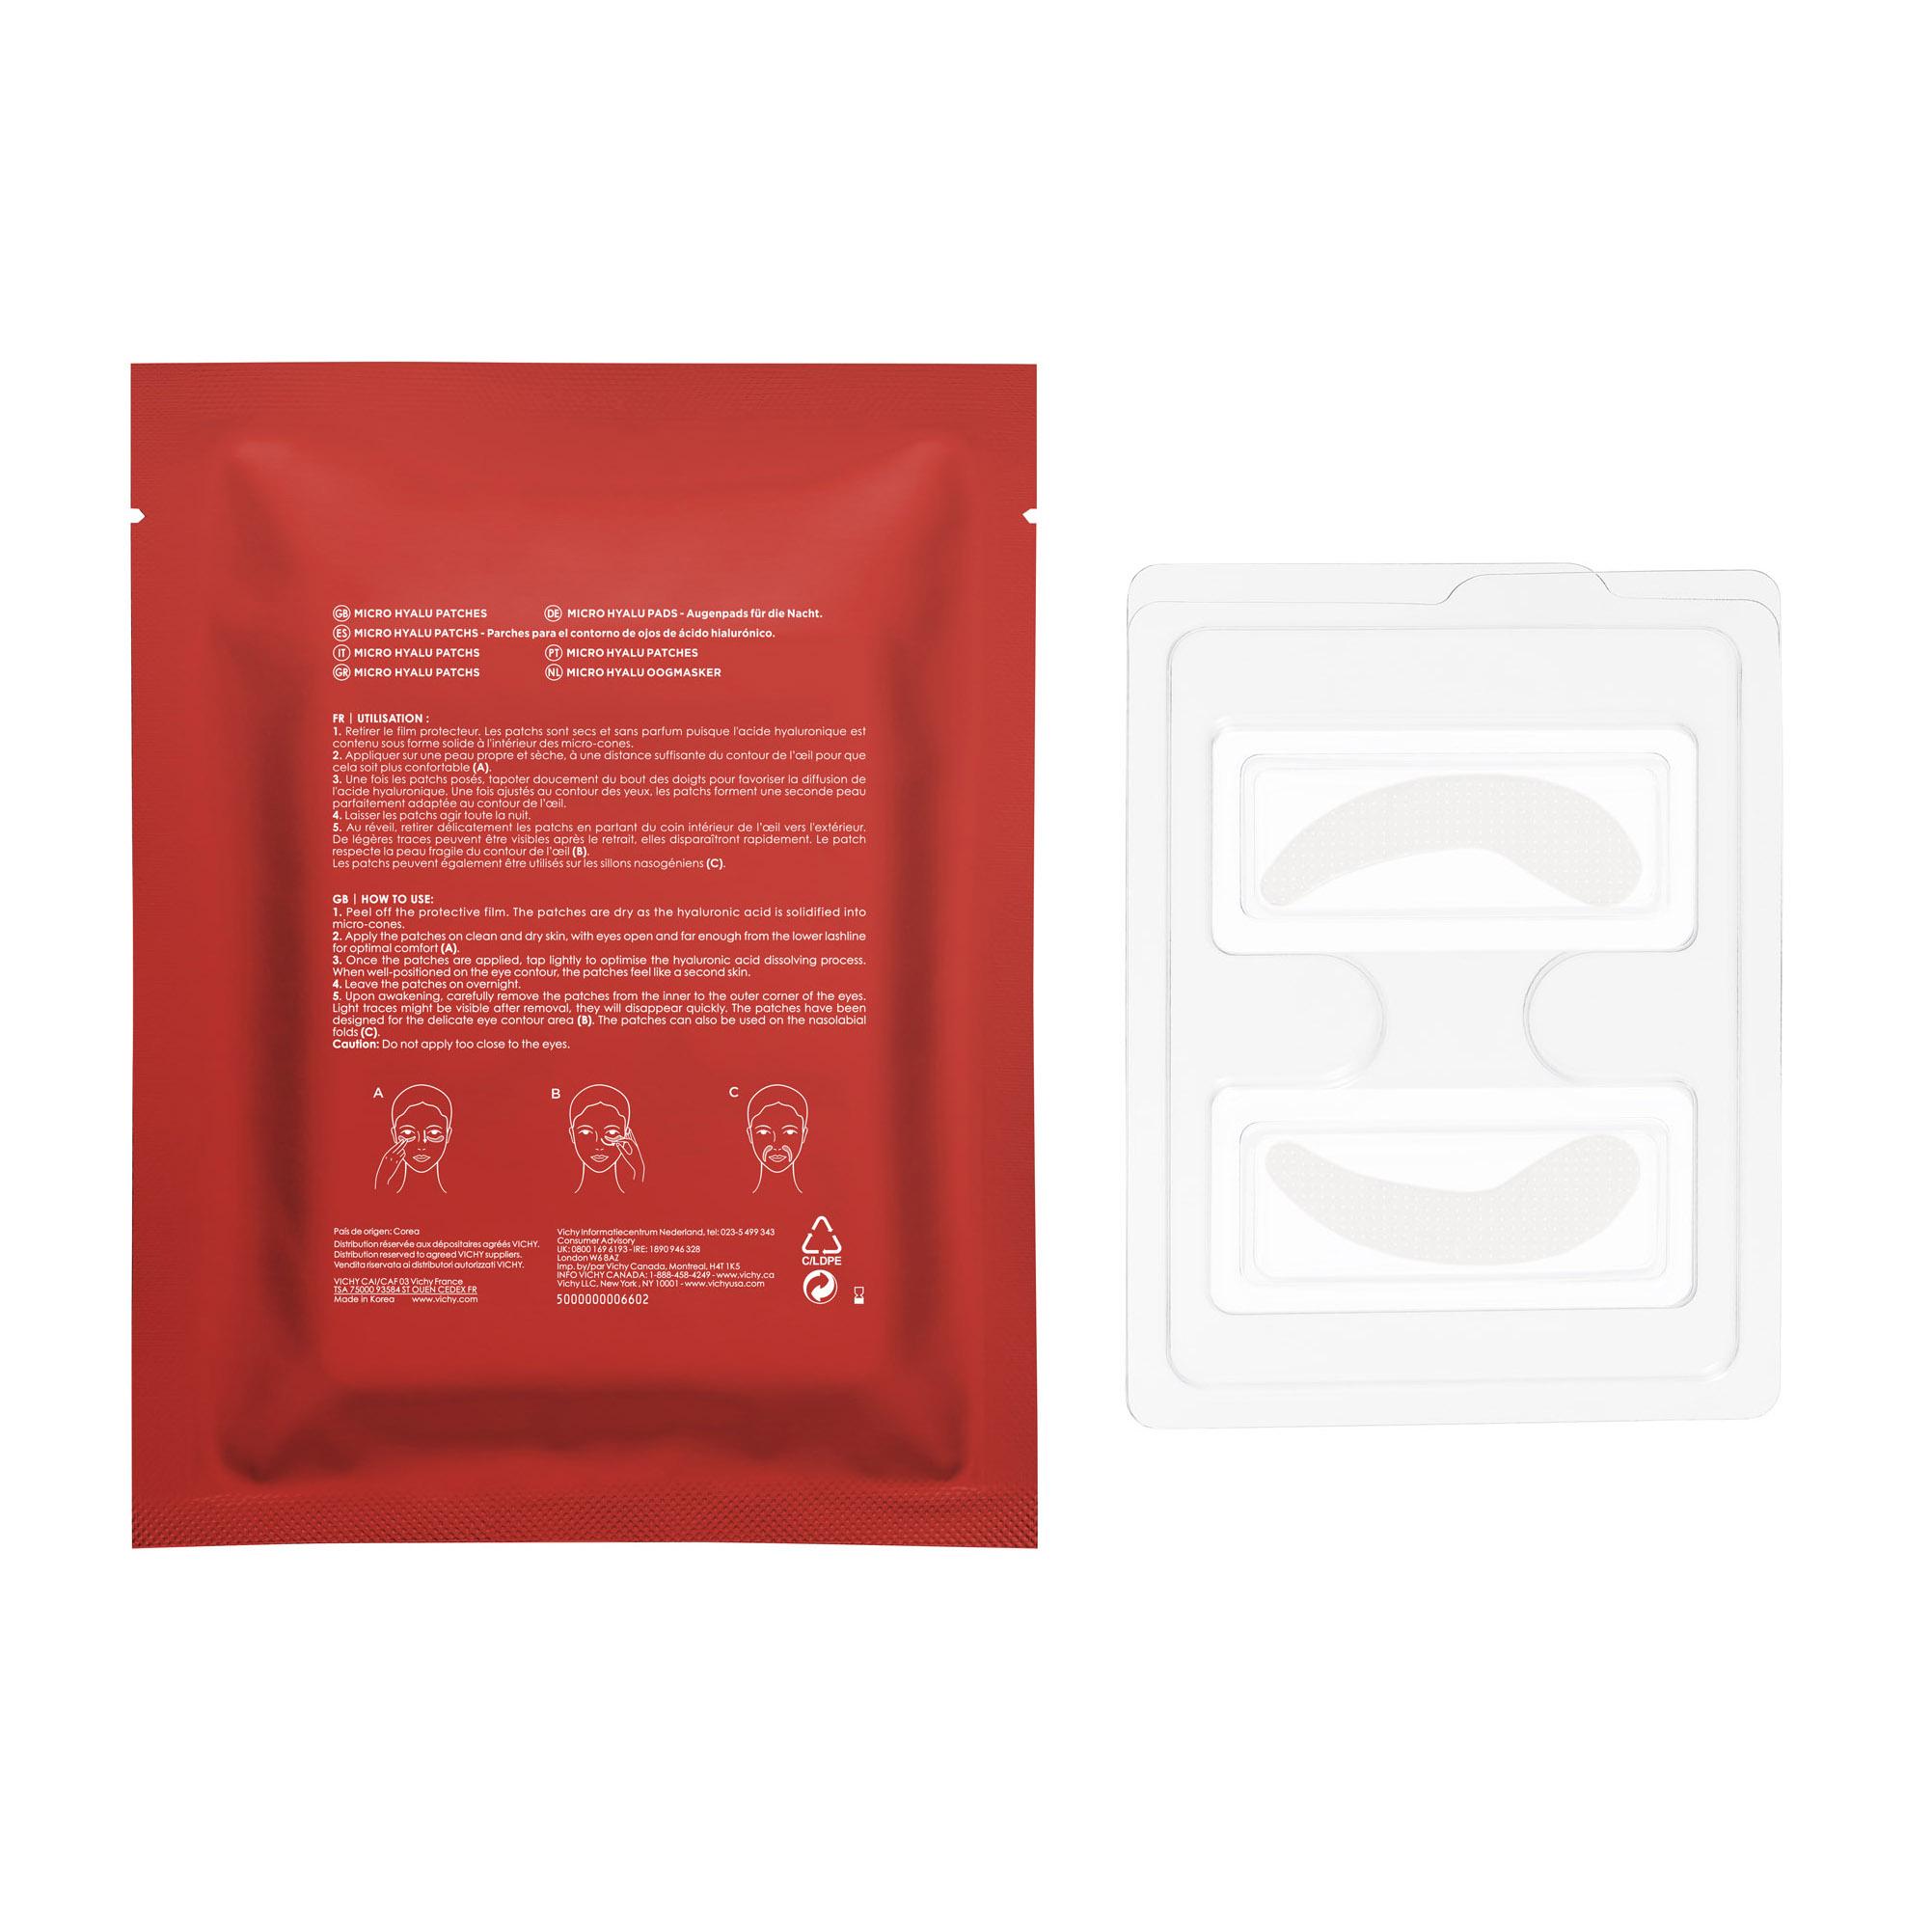 Plasturi antirid pentru zona ochilor cu acid hialuronic Liftactiv Micro Hyalu Patches, 2 bucați, Vichy